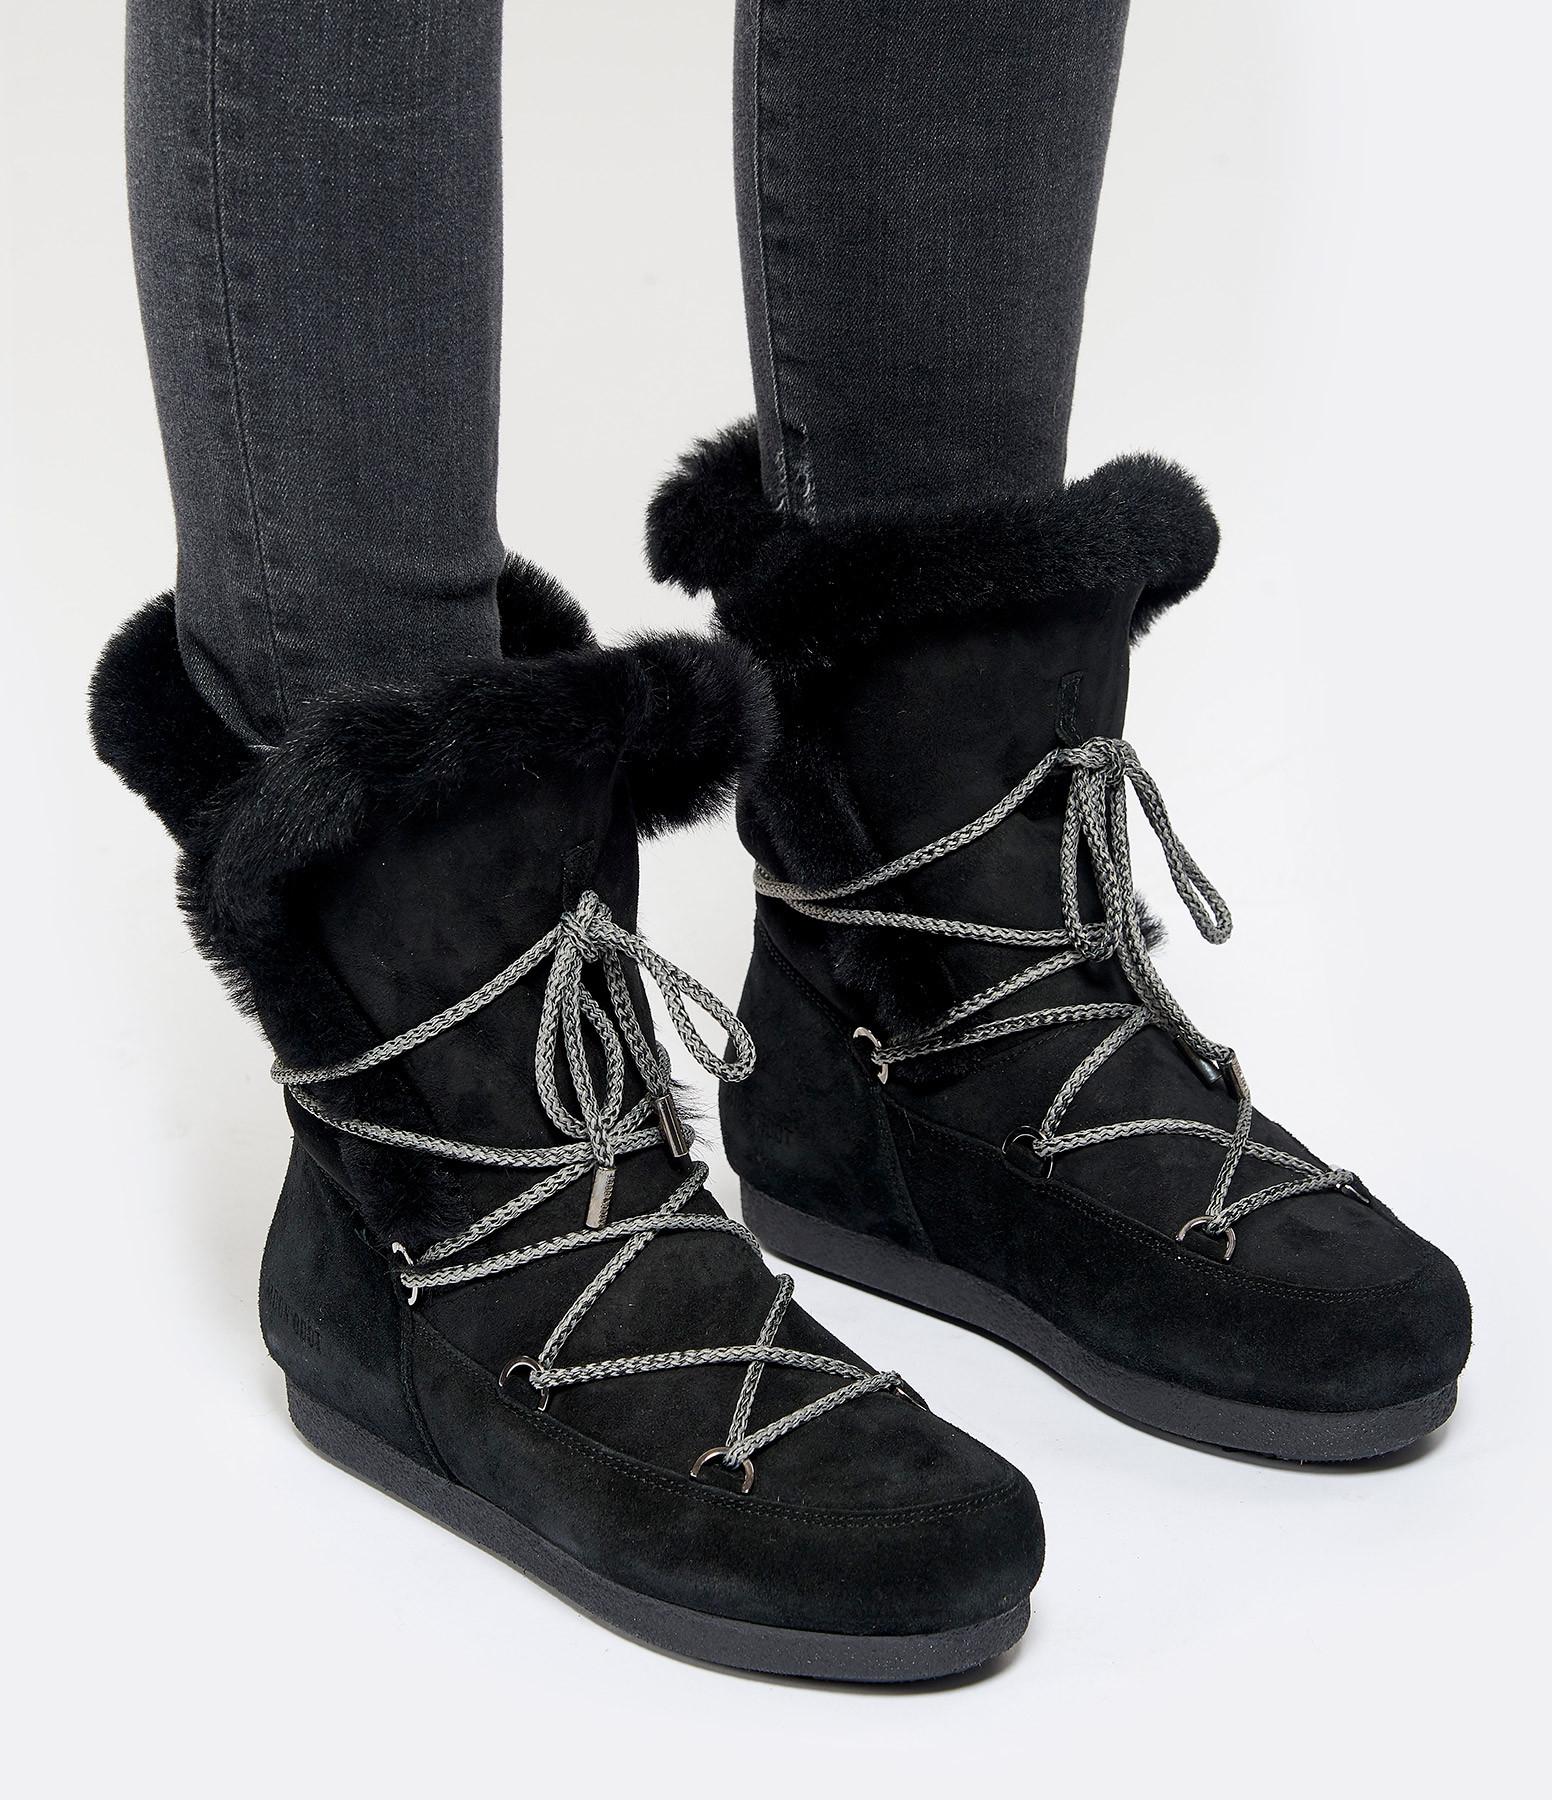 MOON BOOT - Moon Boot Hautes Far Side Noir